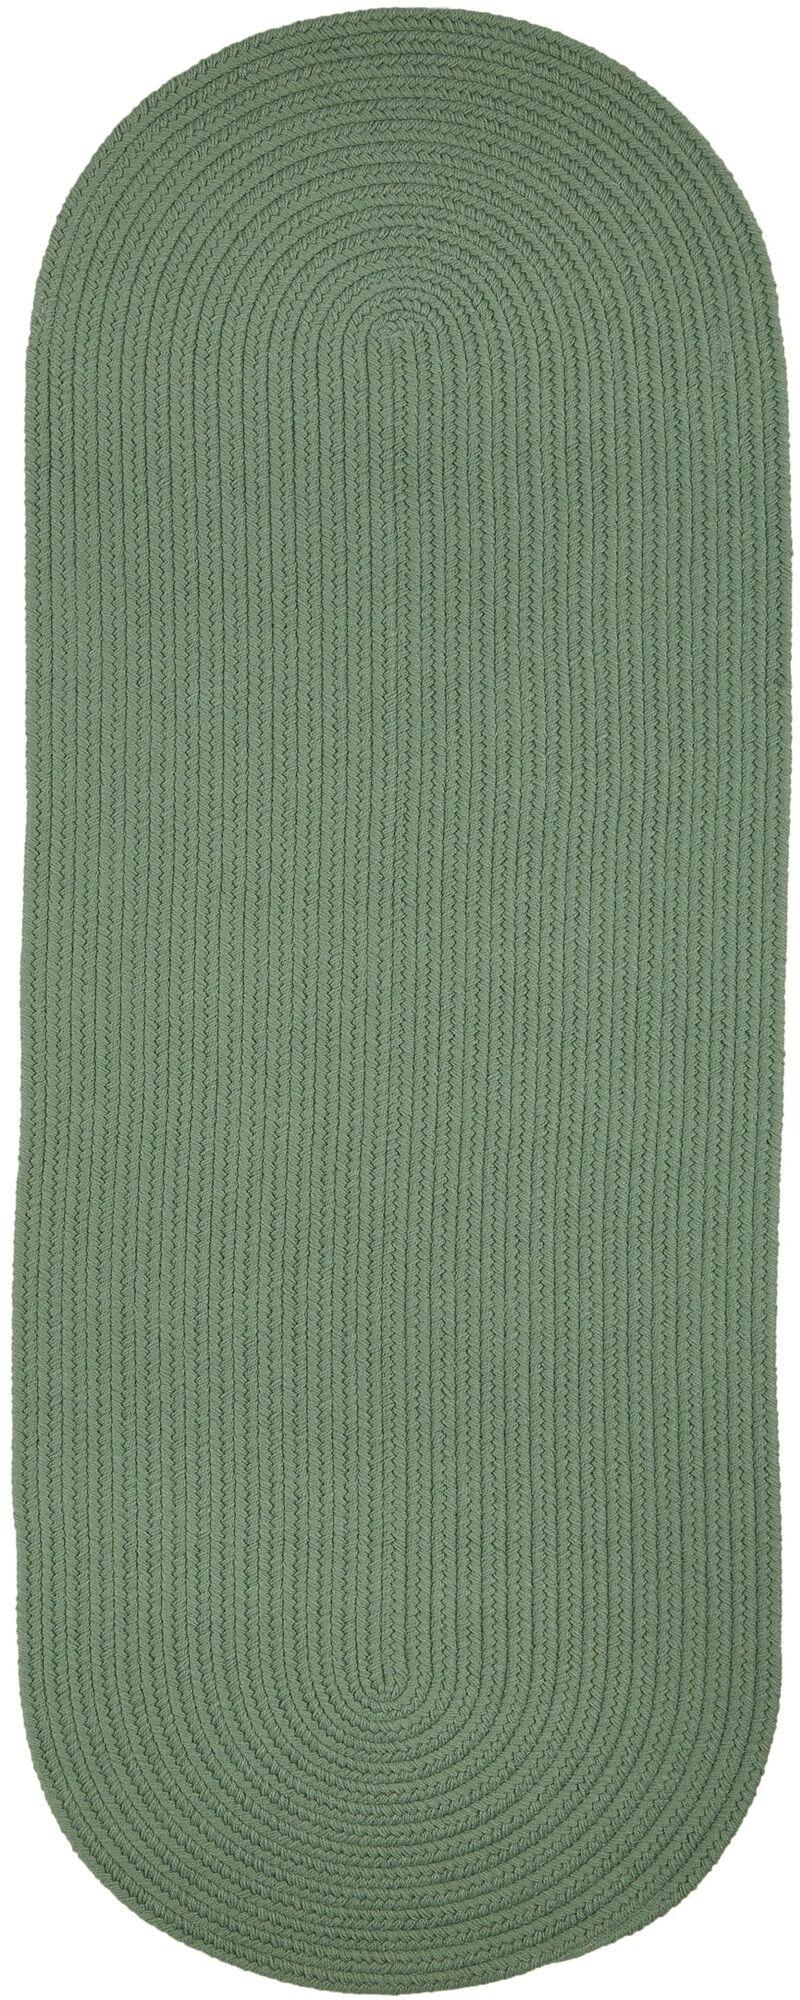 Handmade Green Indoor/Outdoor Area Rug Rug Size: Oval  2' x 3'